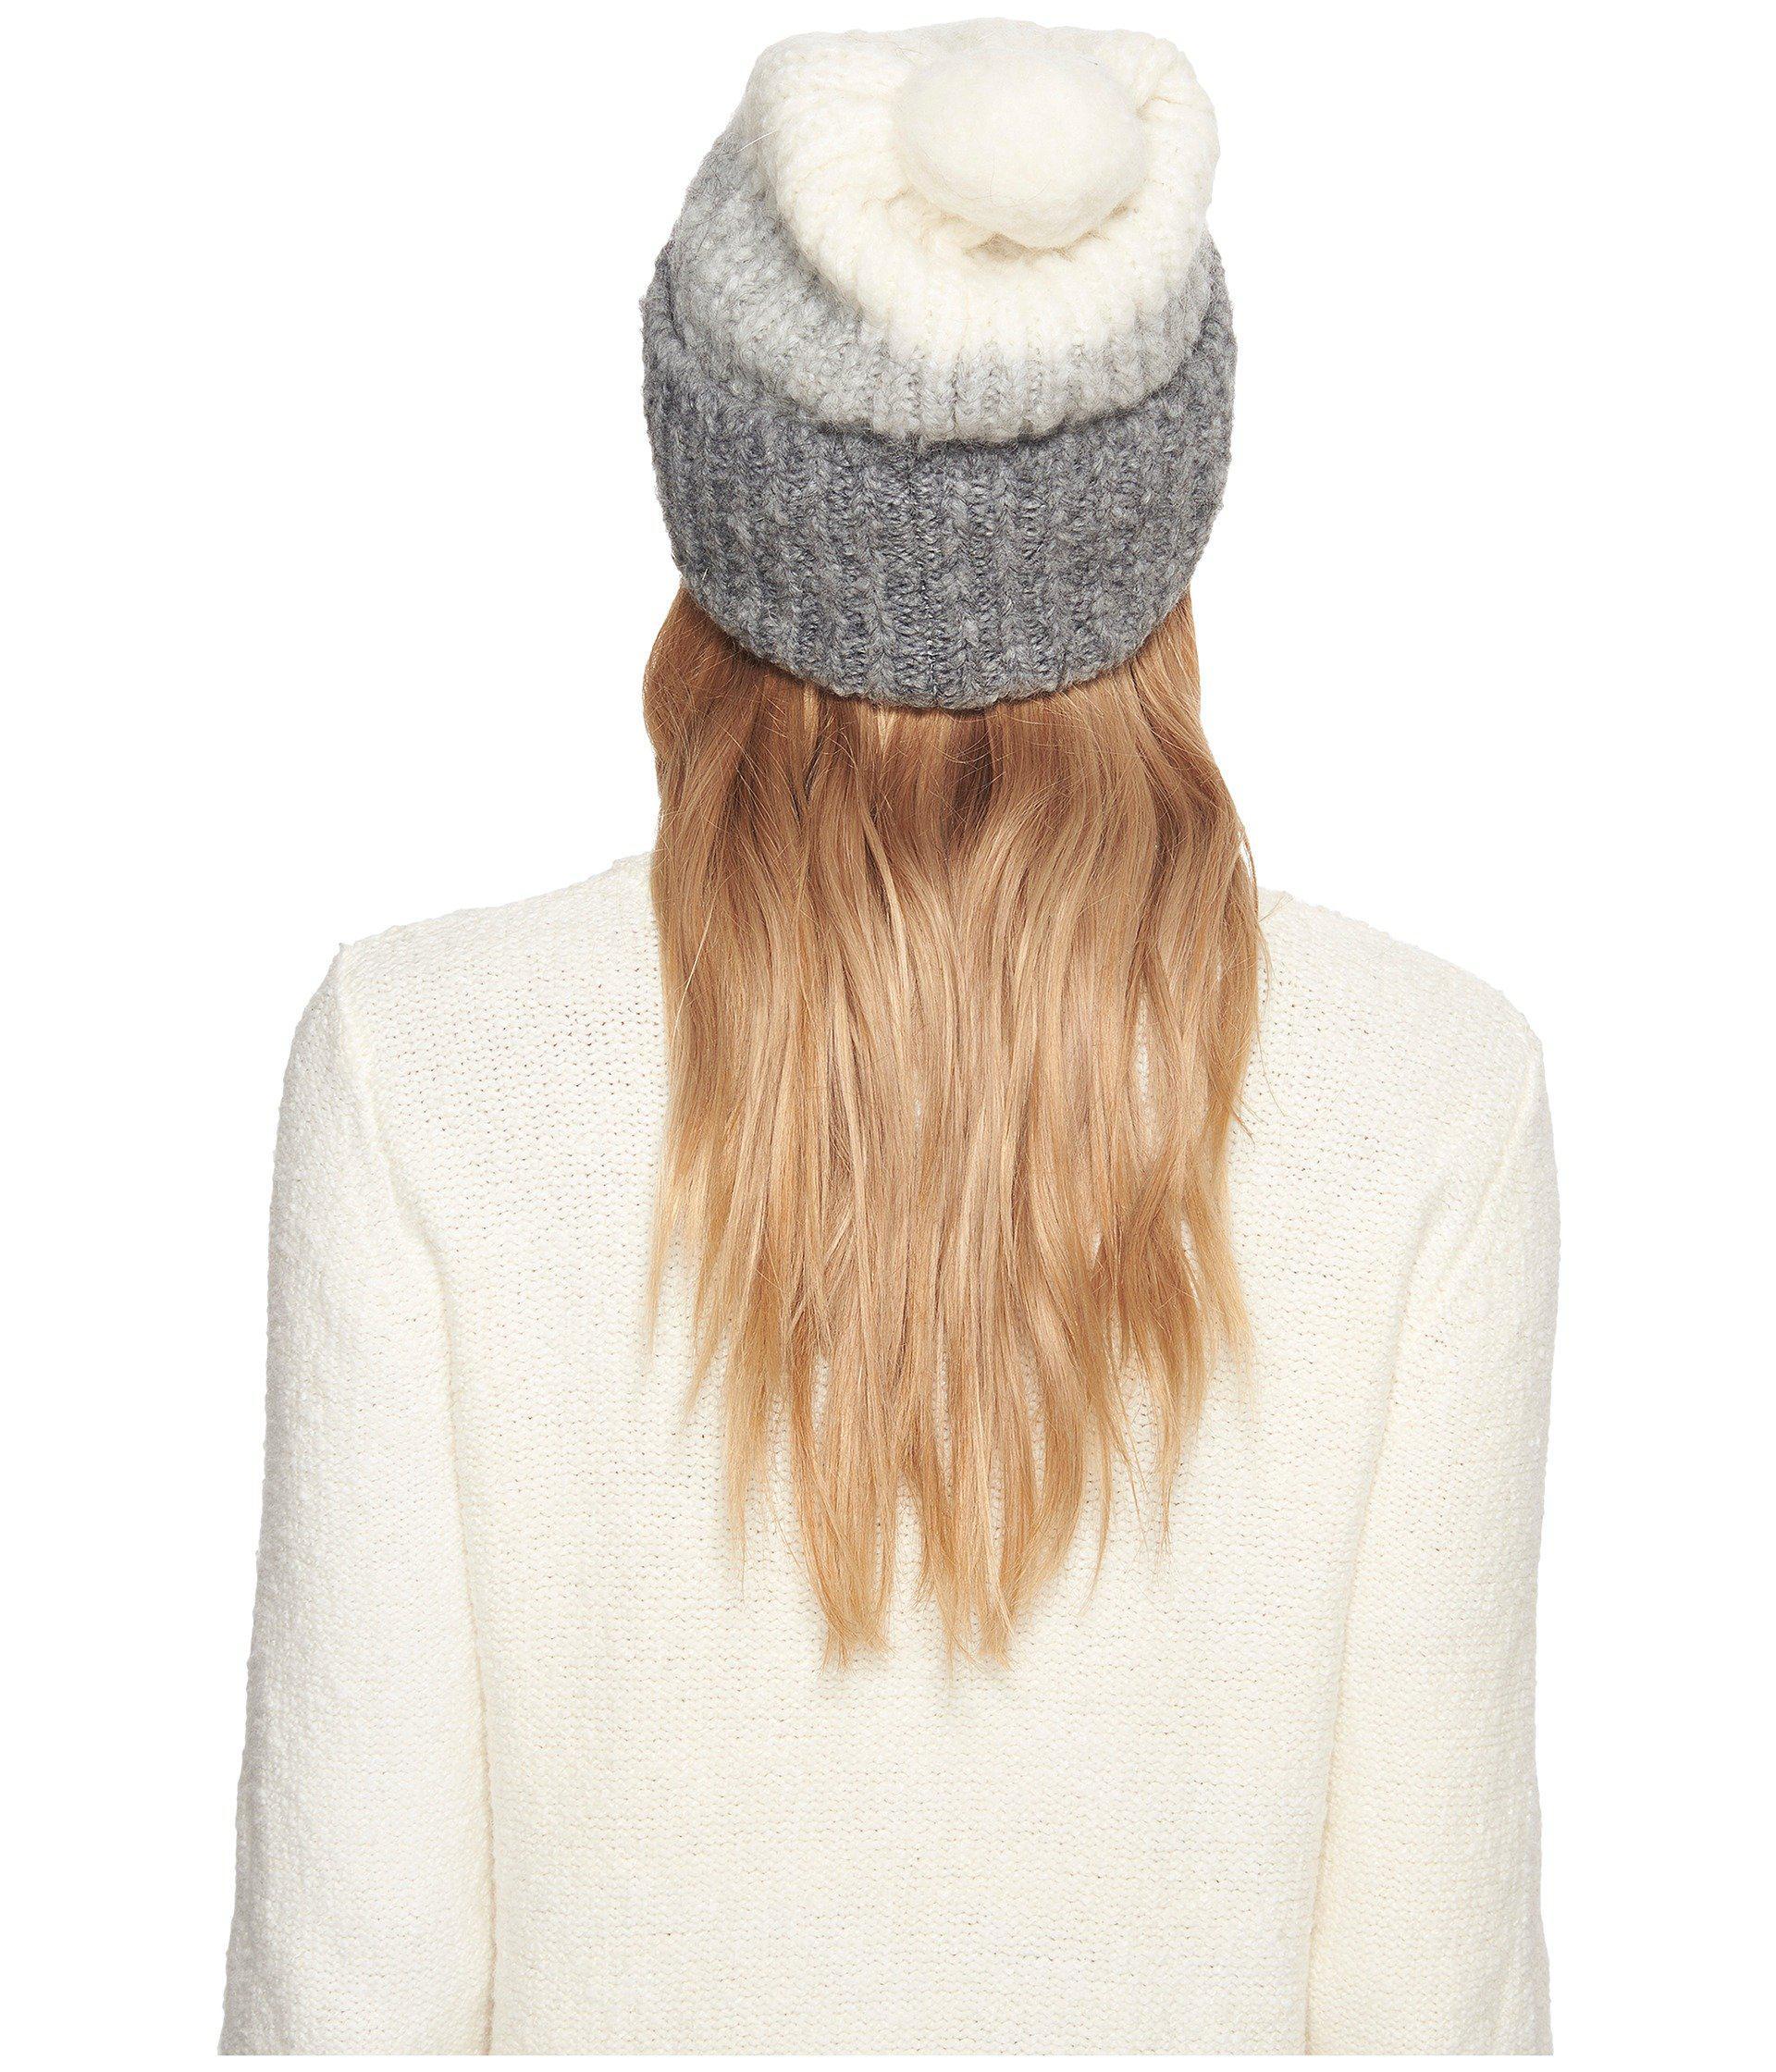 79247493678 Lyst - UGG Three Color Lofty Pom Hat in Gray